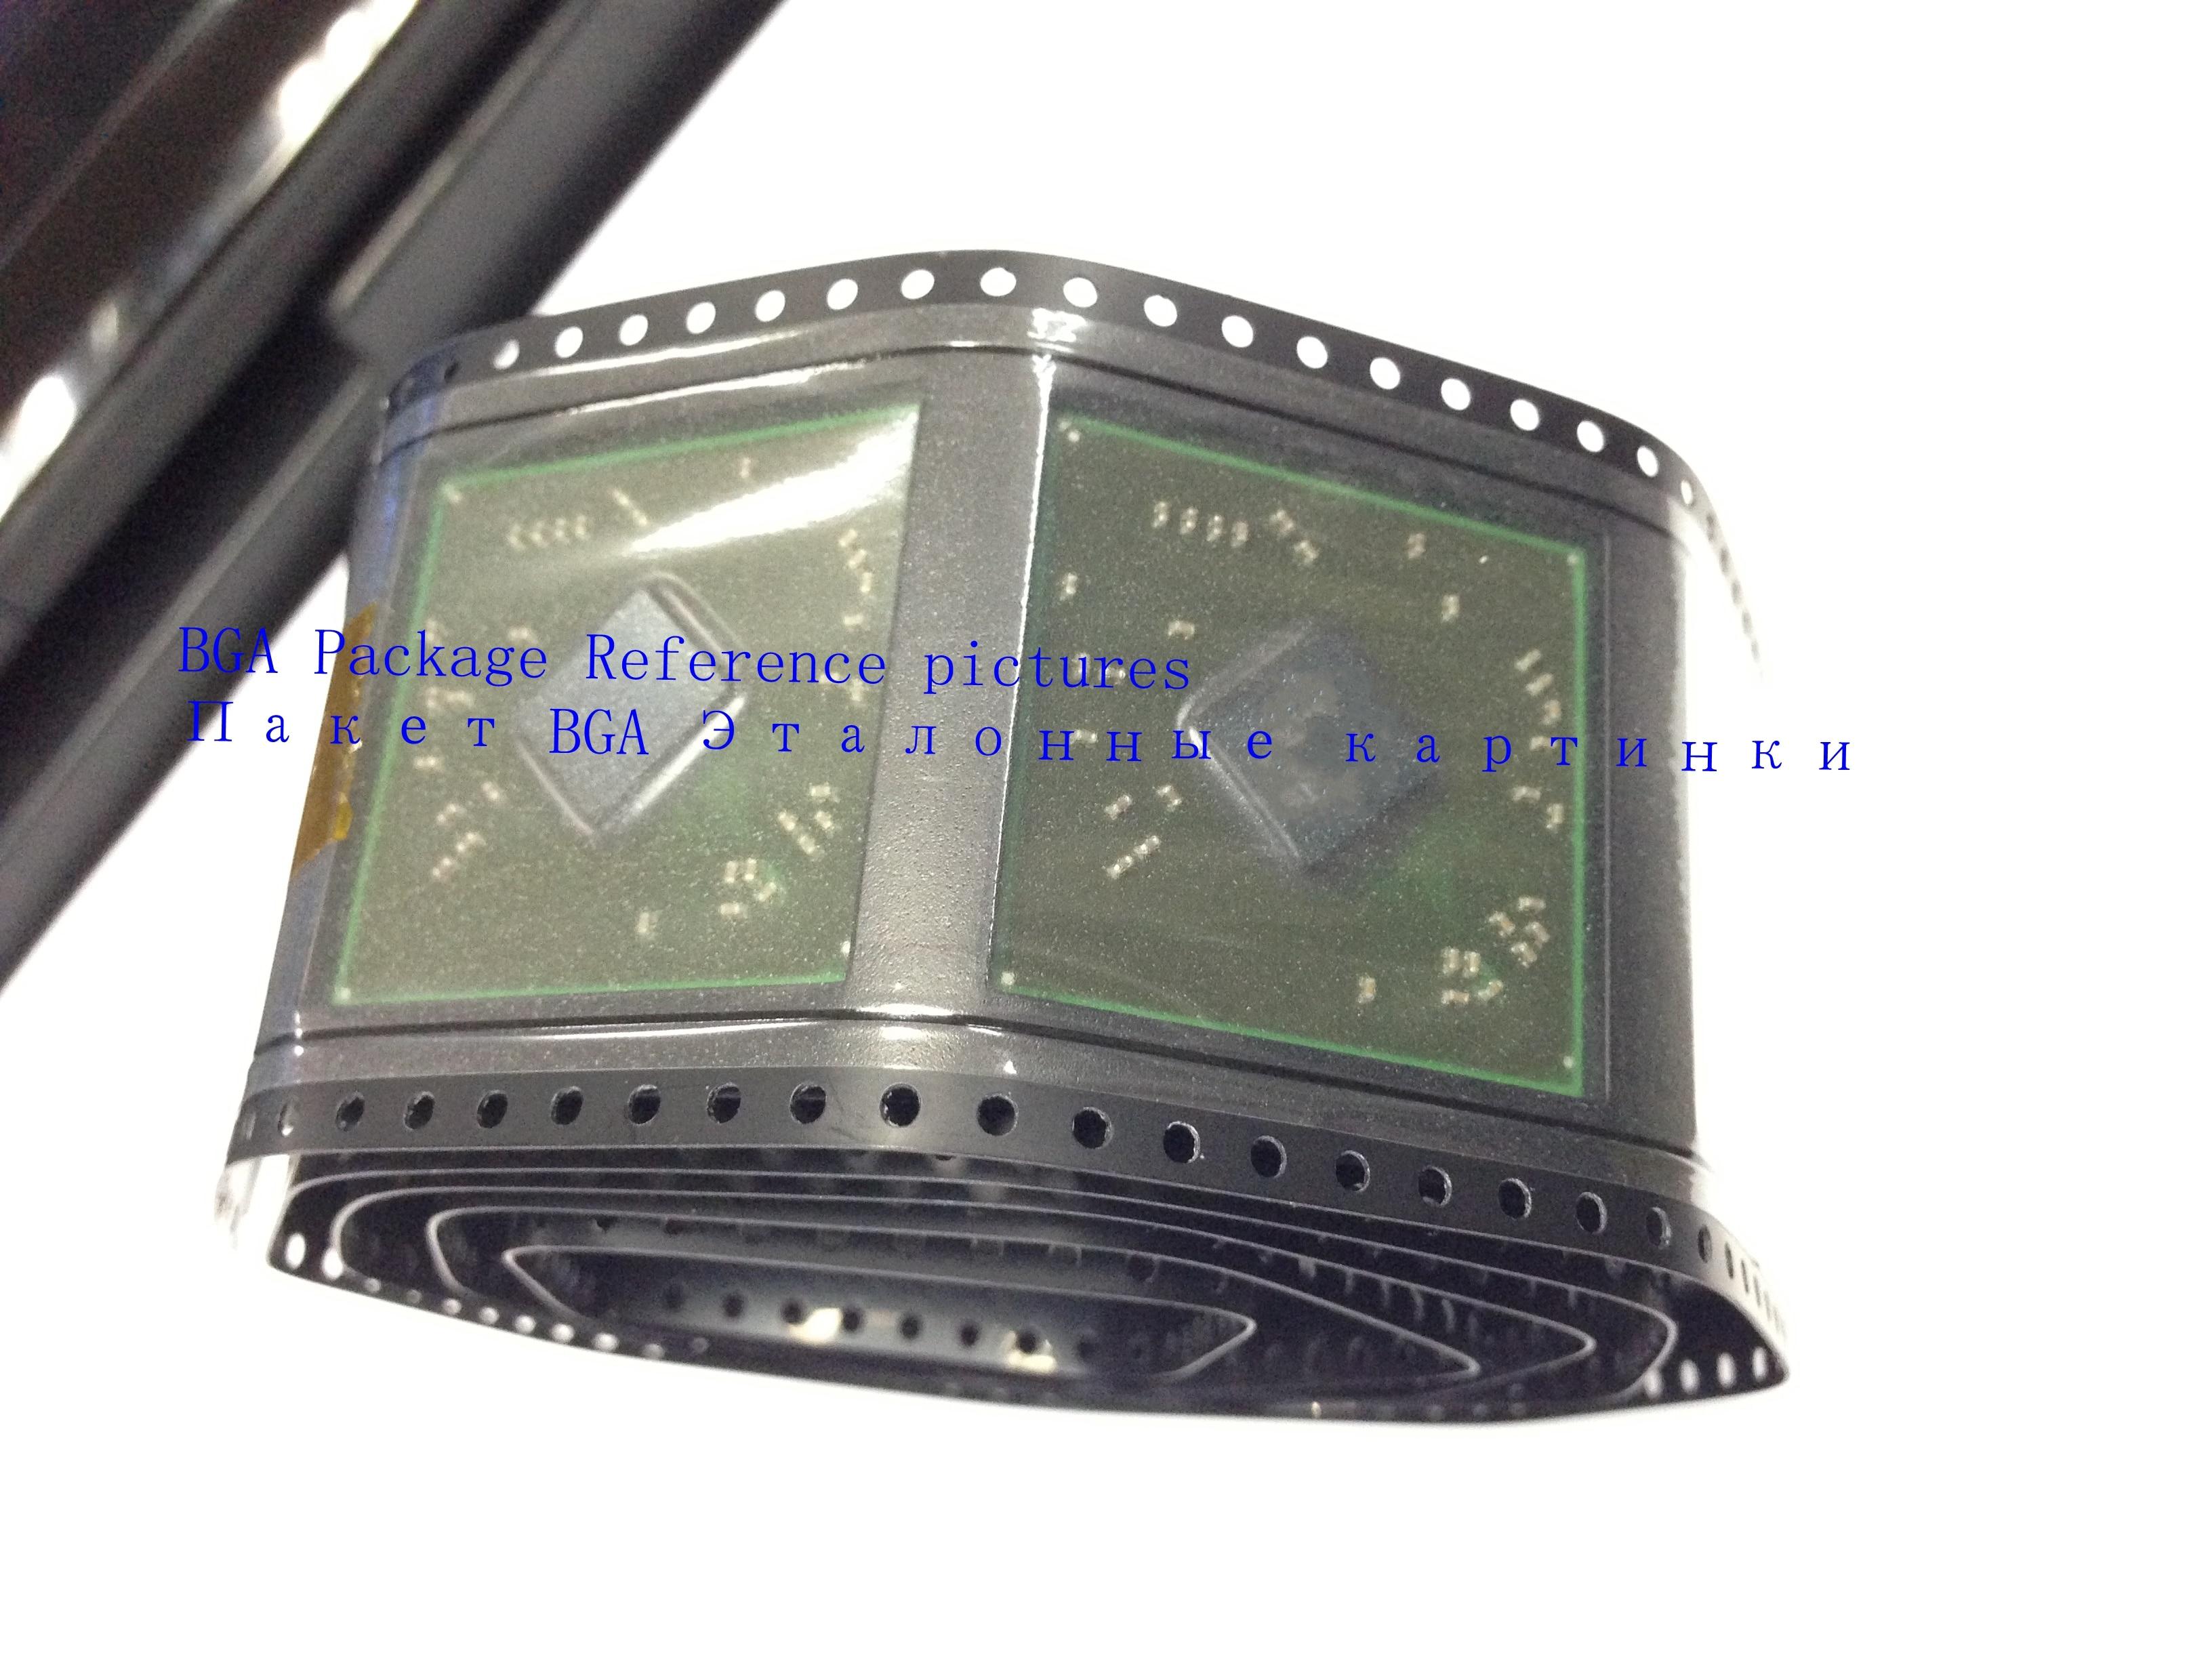 1pcs/lot 100% test very good product N2840 SR1YJ cpu bga chip reball with balls IC chips1pcs/lot 100% test very good product N2840 SR1YJ cpu bga chip reball with balls IC chips